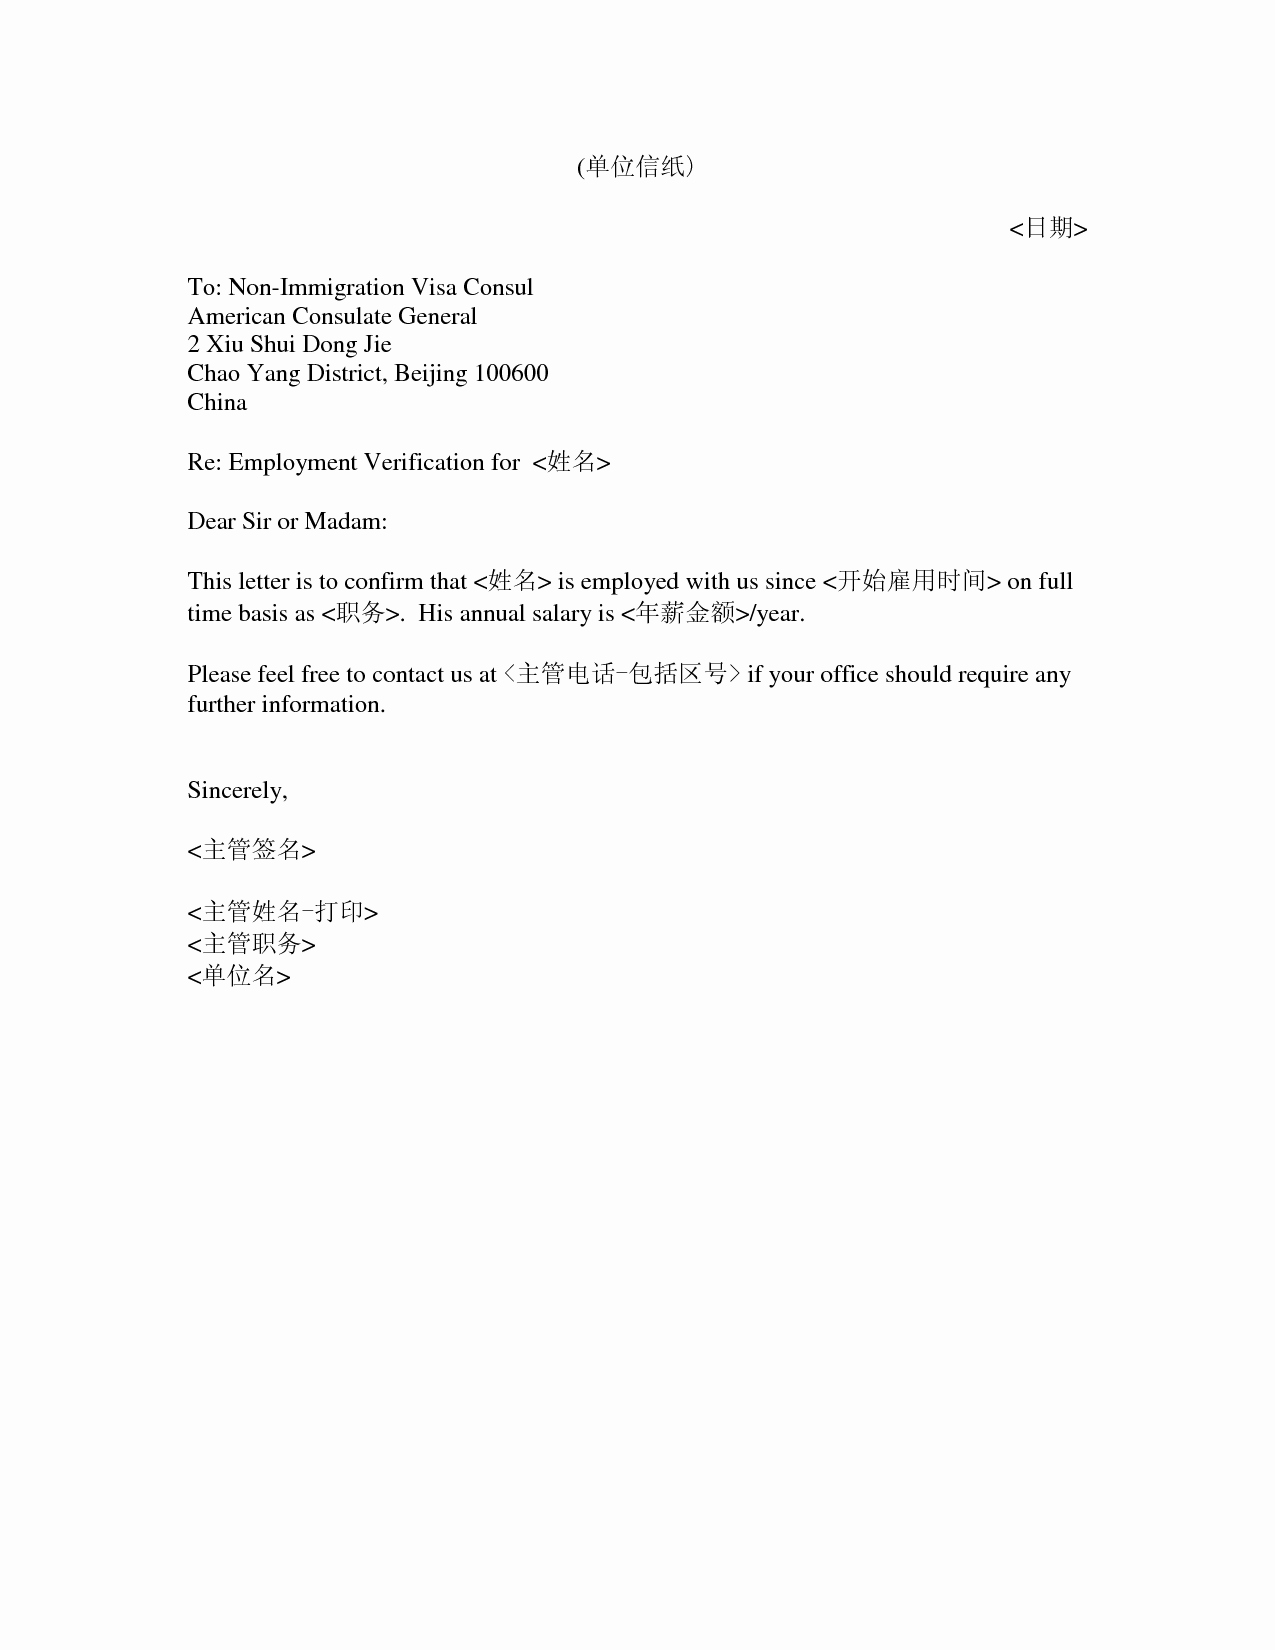 Immigration Recommendation Letter Sample Unique Job Letter for Immigration